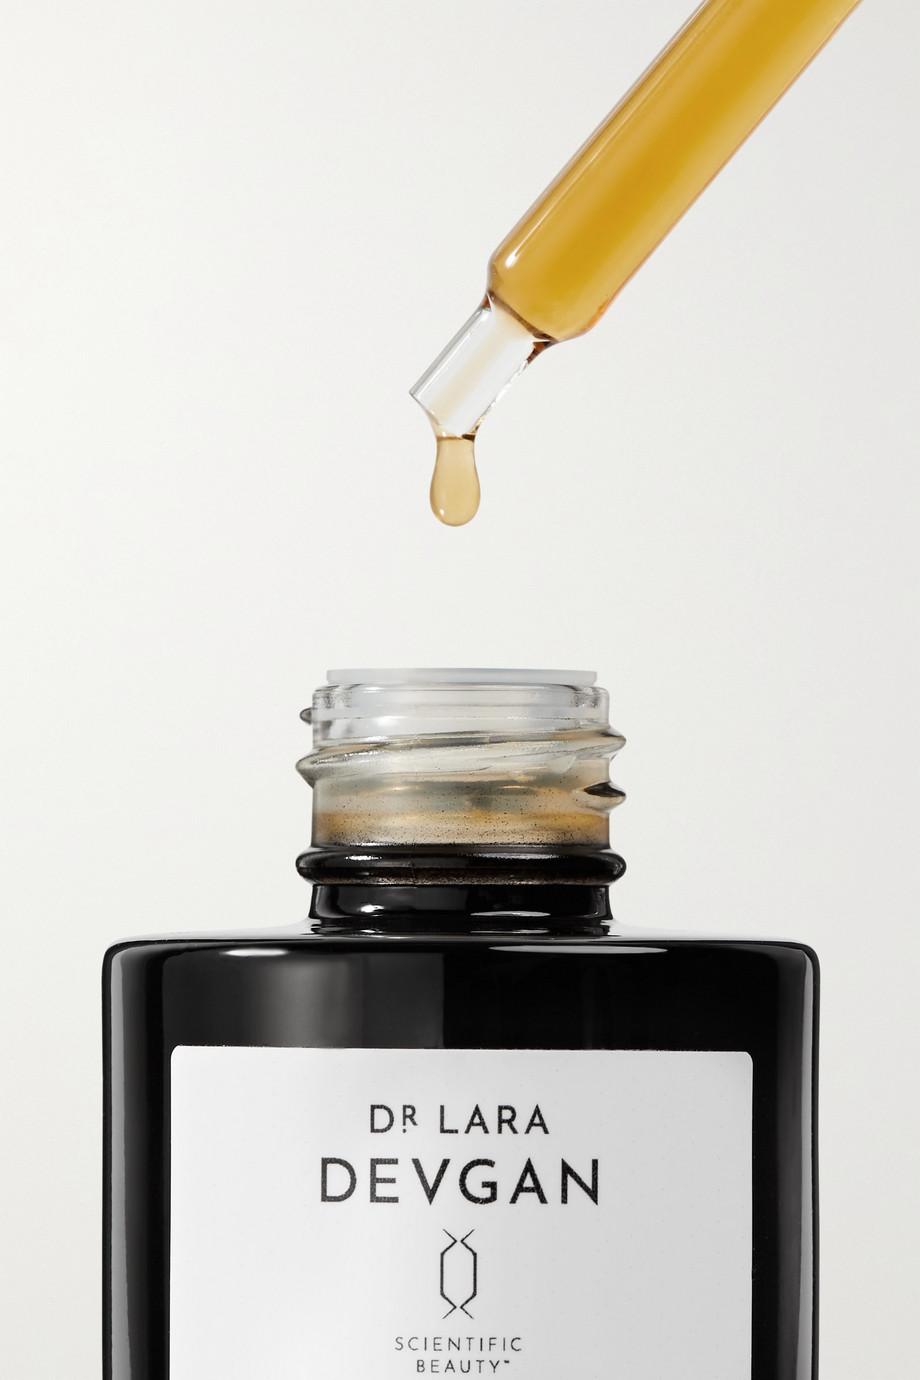 Dr Lara Devgan Retinol + Bakuchiol Serum 2.5x, 30ml